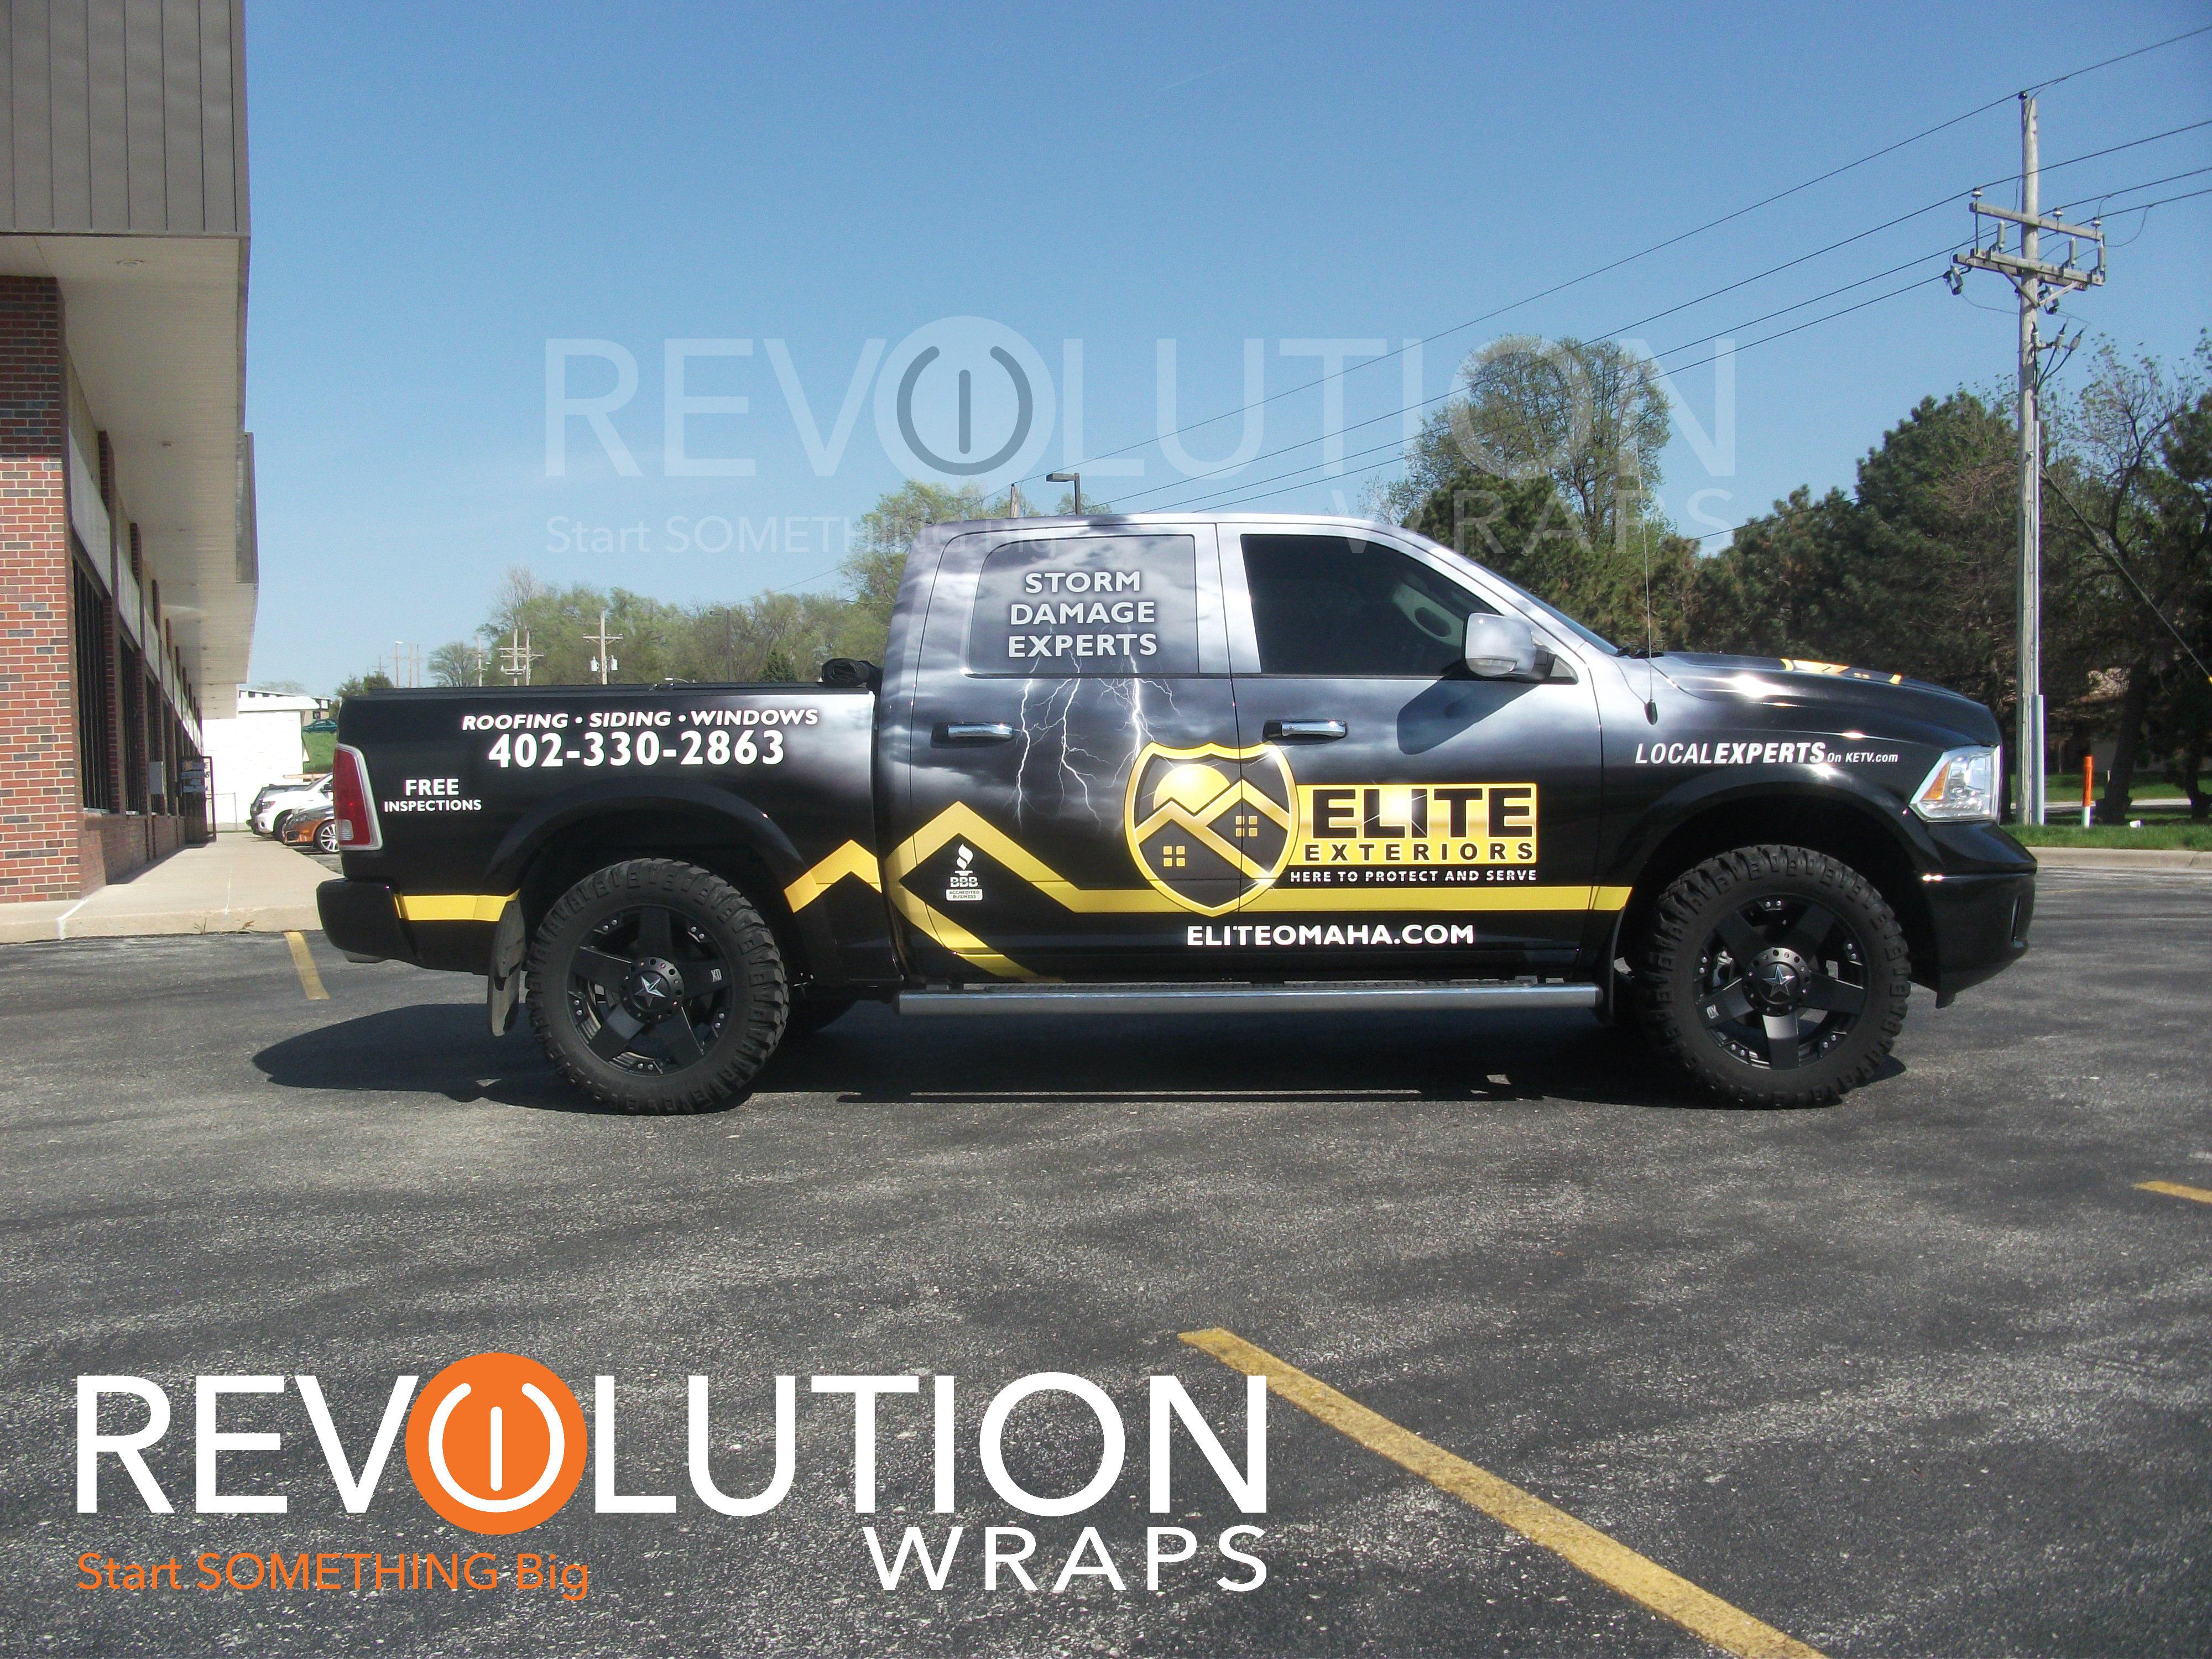 Elite Exteriors Gets all Wrapped up! - Revolution Wraps